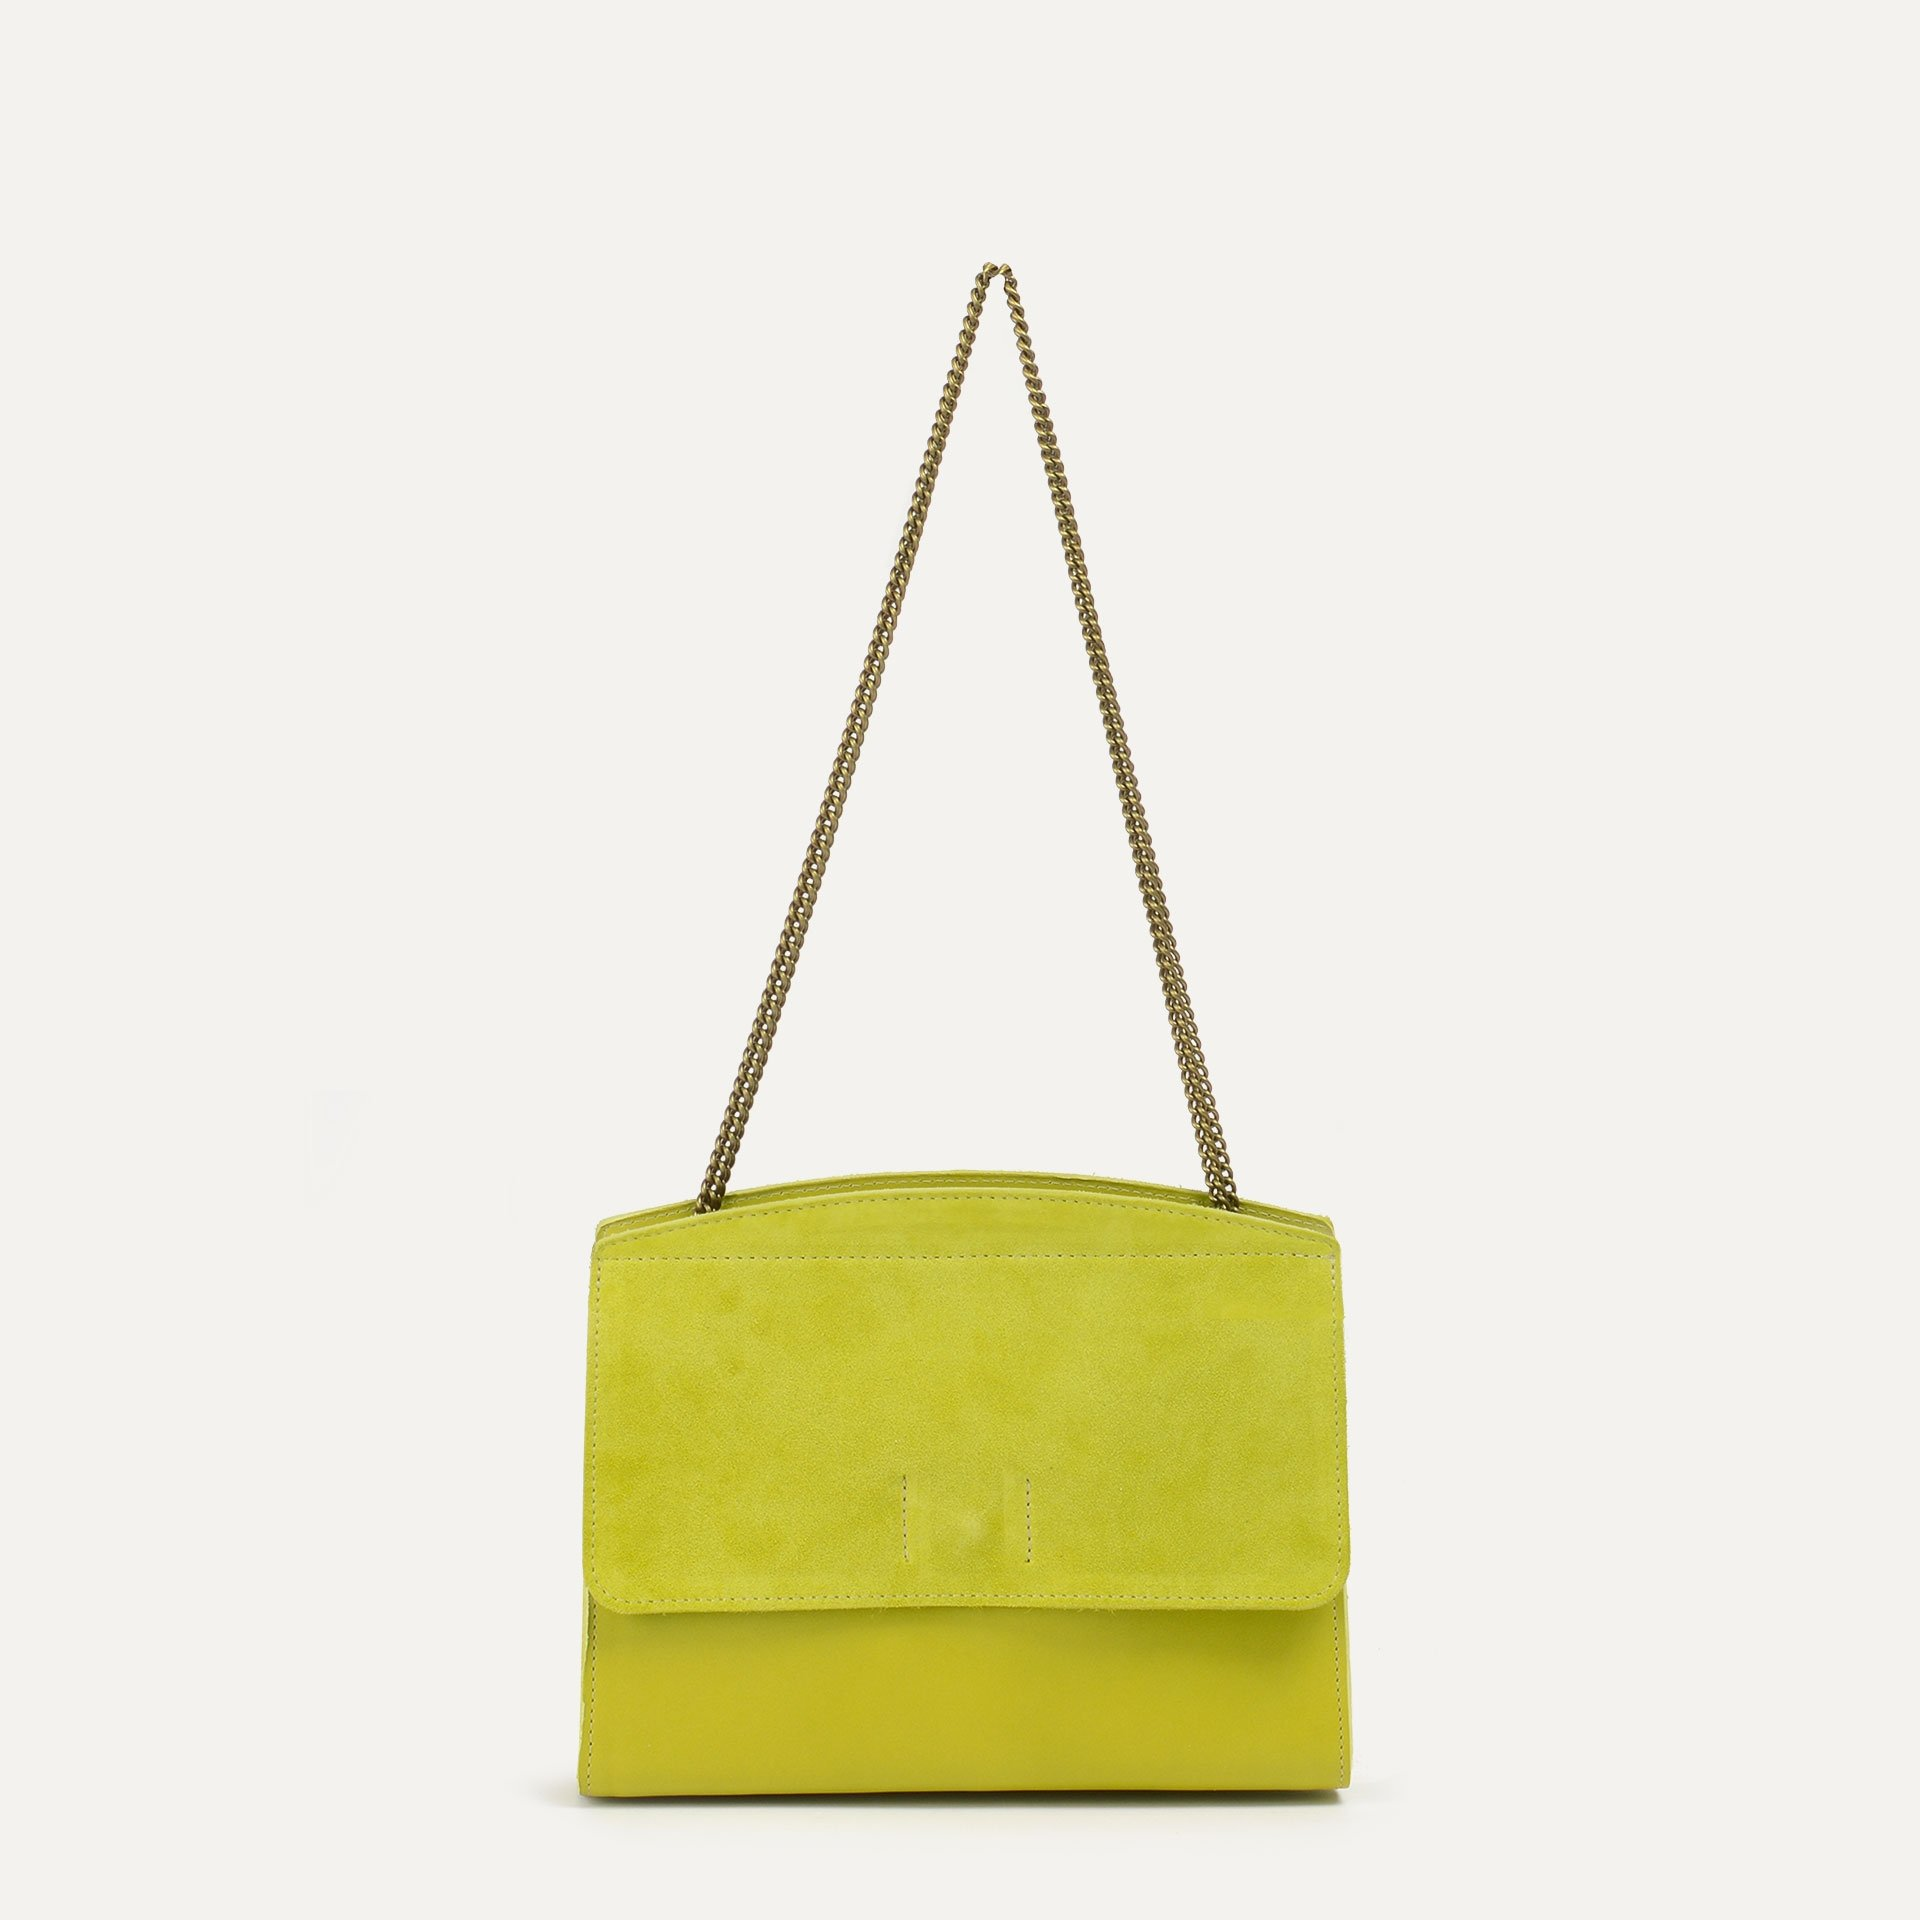 Origami S clutch bag - Bergamot (image n°3)